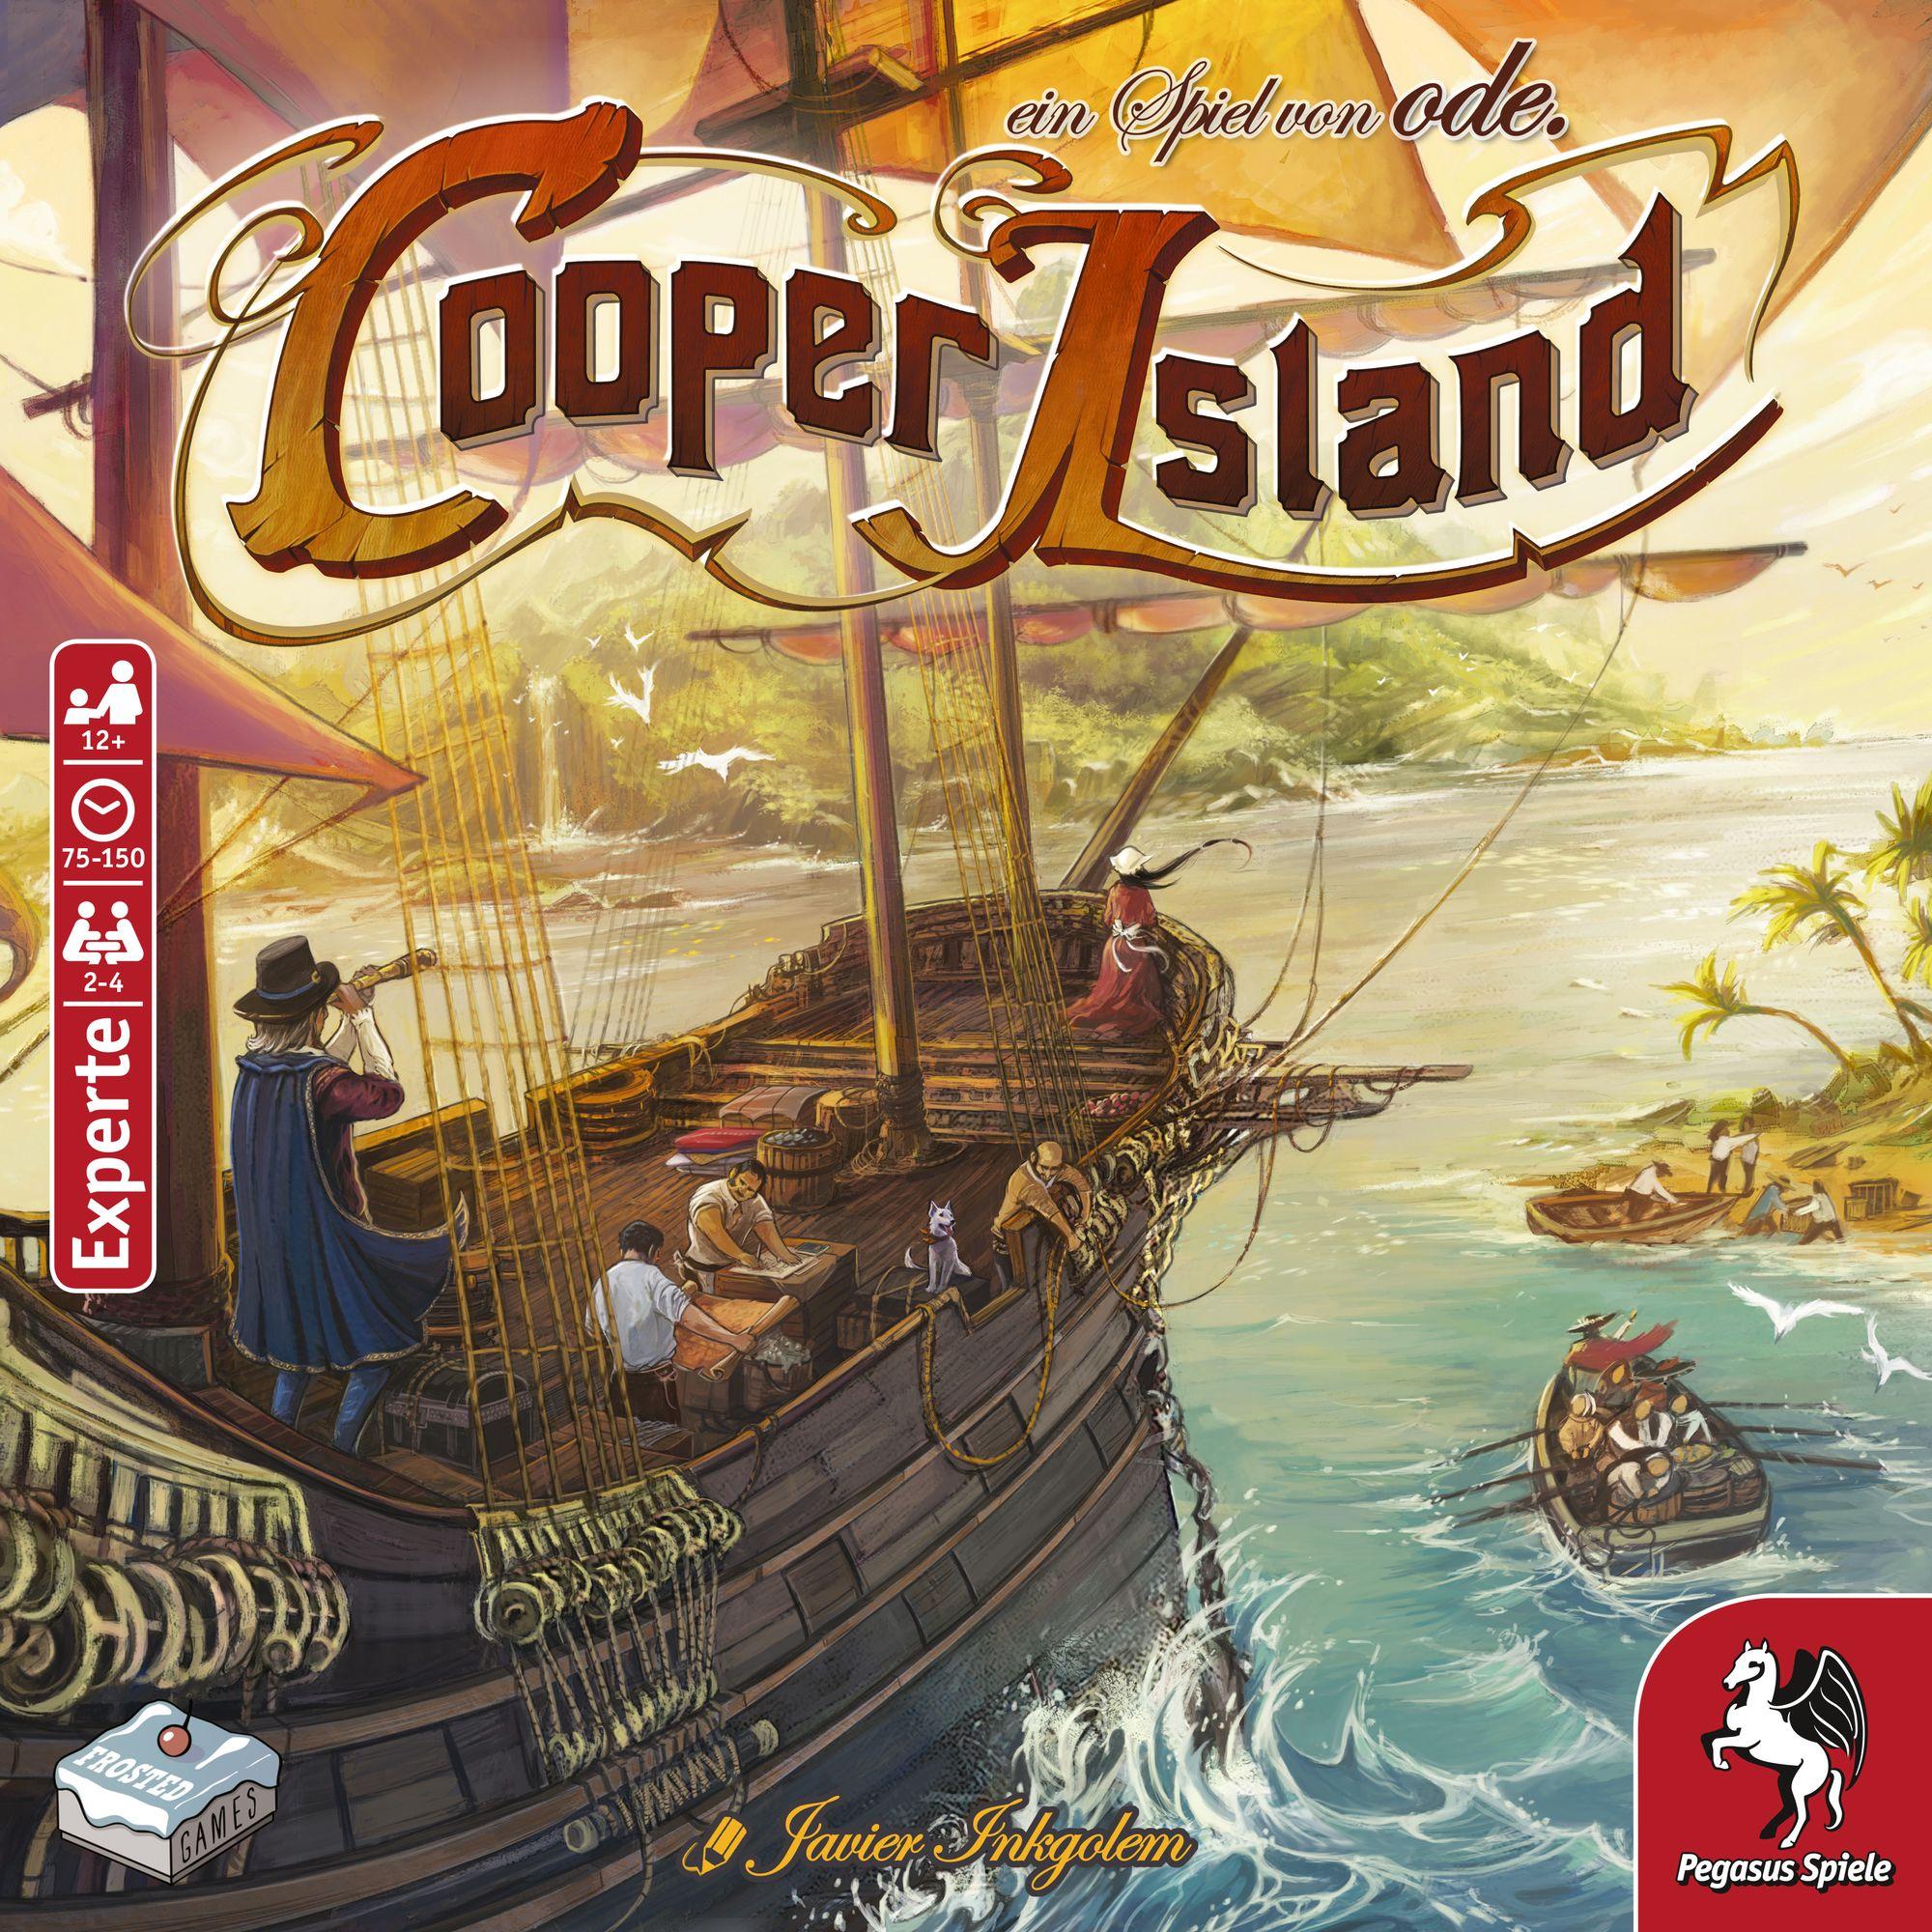 Cooper Island: Boardgamejunkies